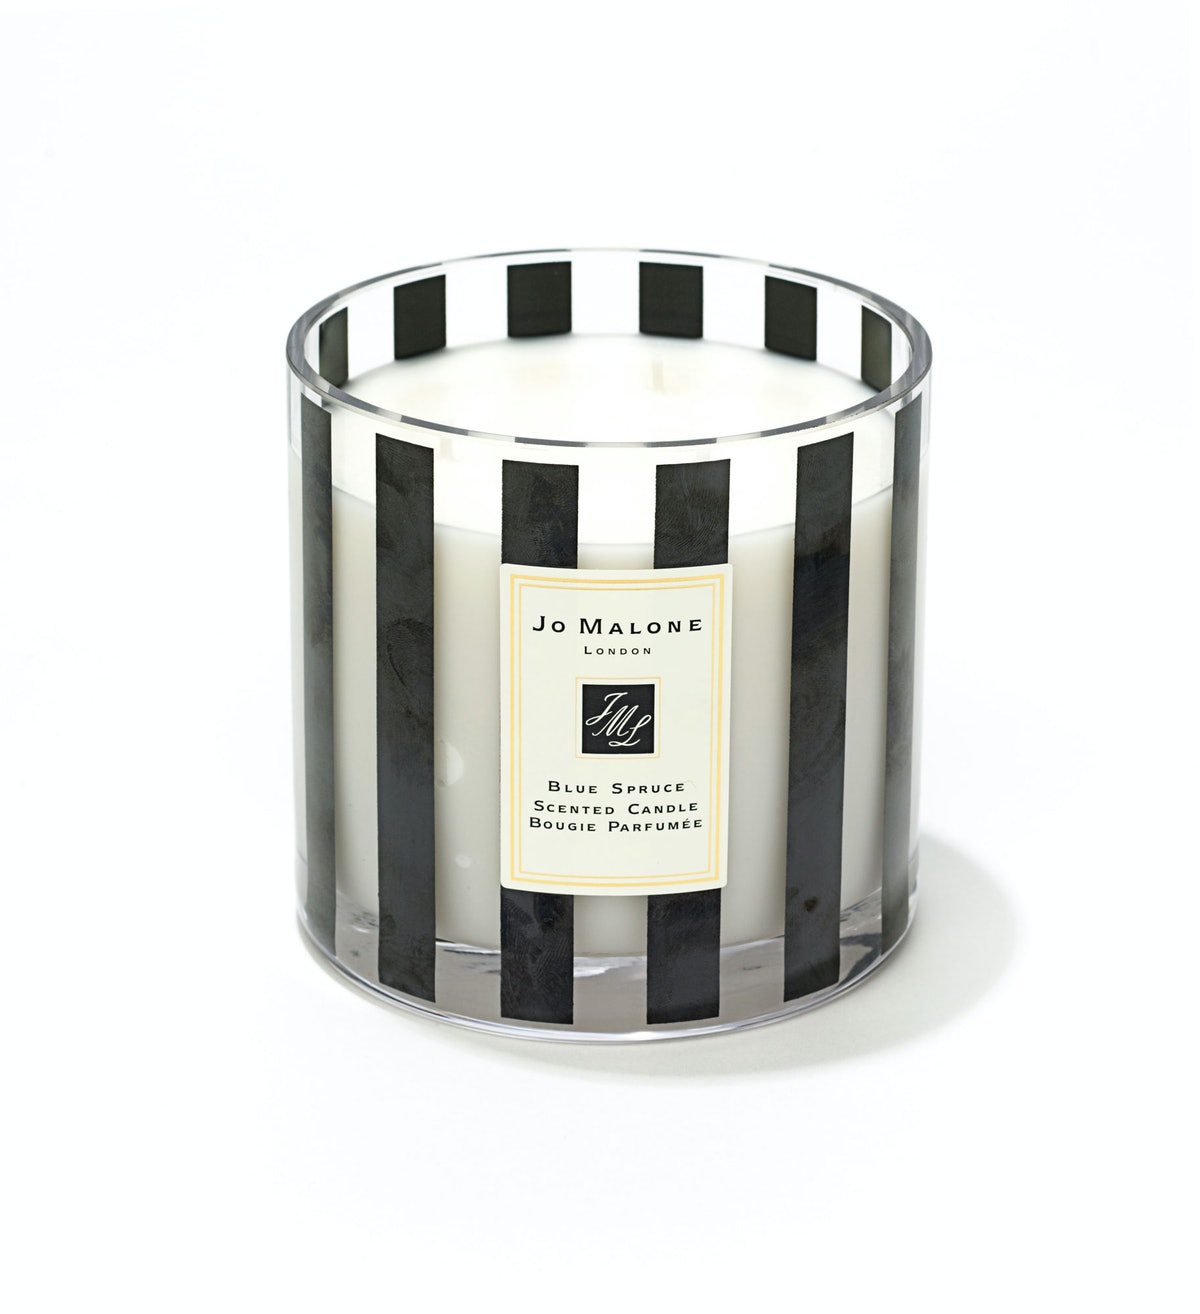 Jo Malone Deluxe candle in Blue Spruce, $195, bergdorfgoodman.com.